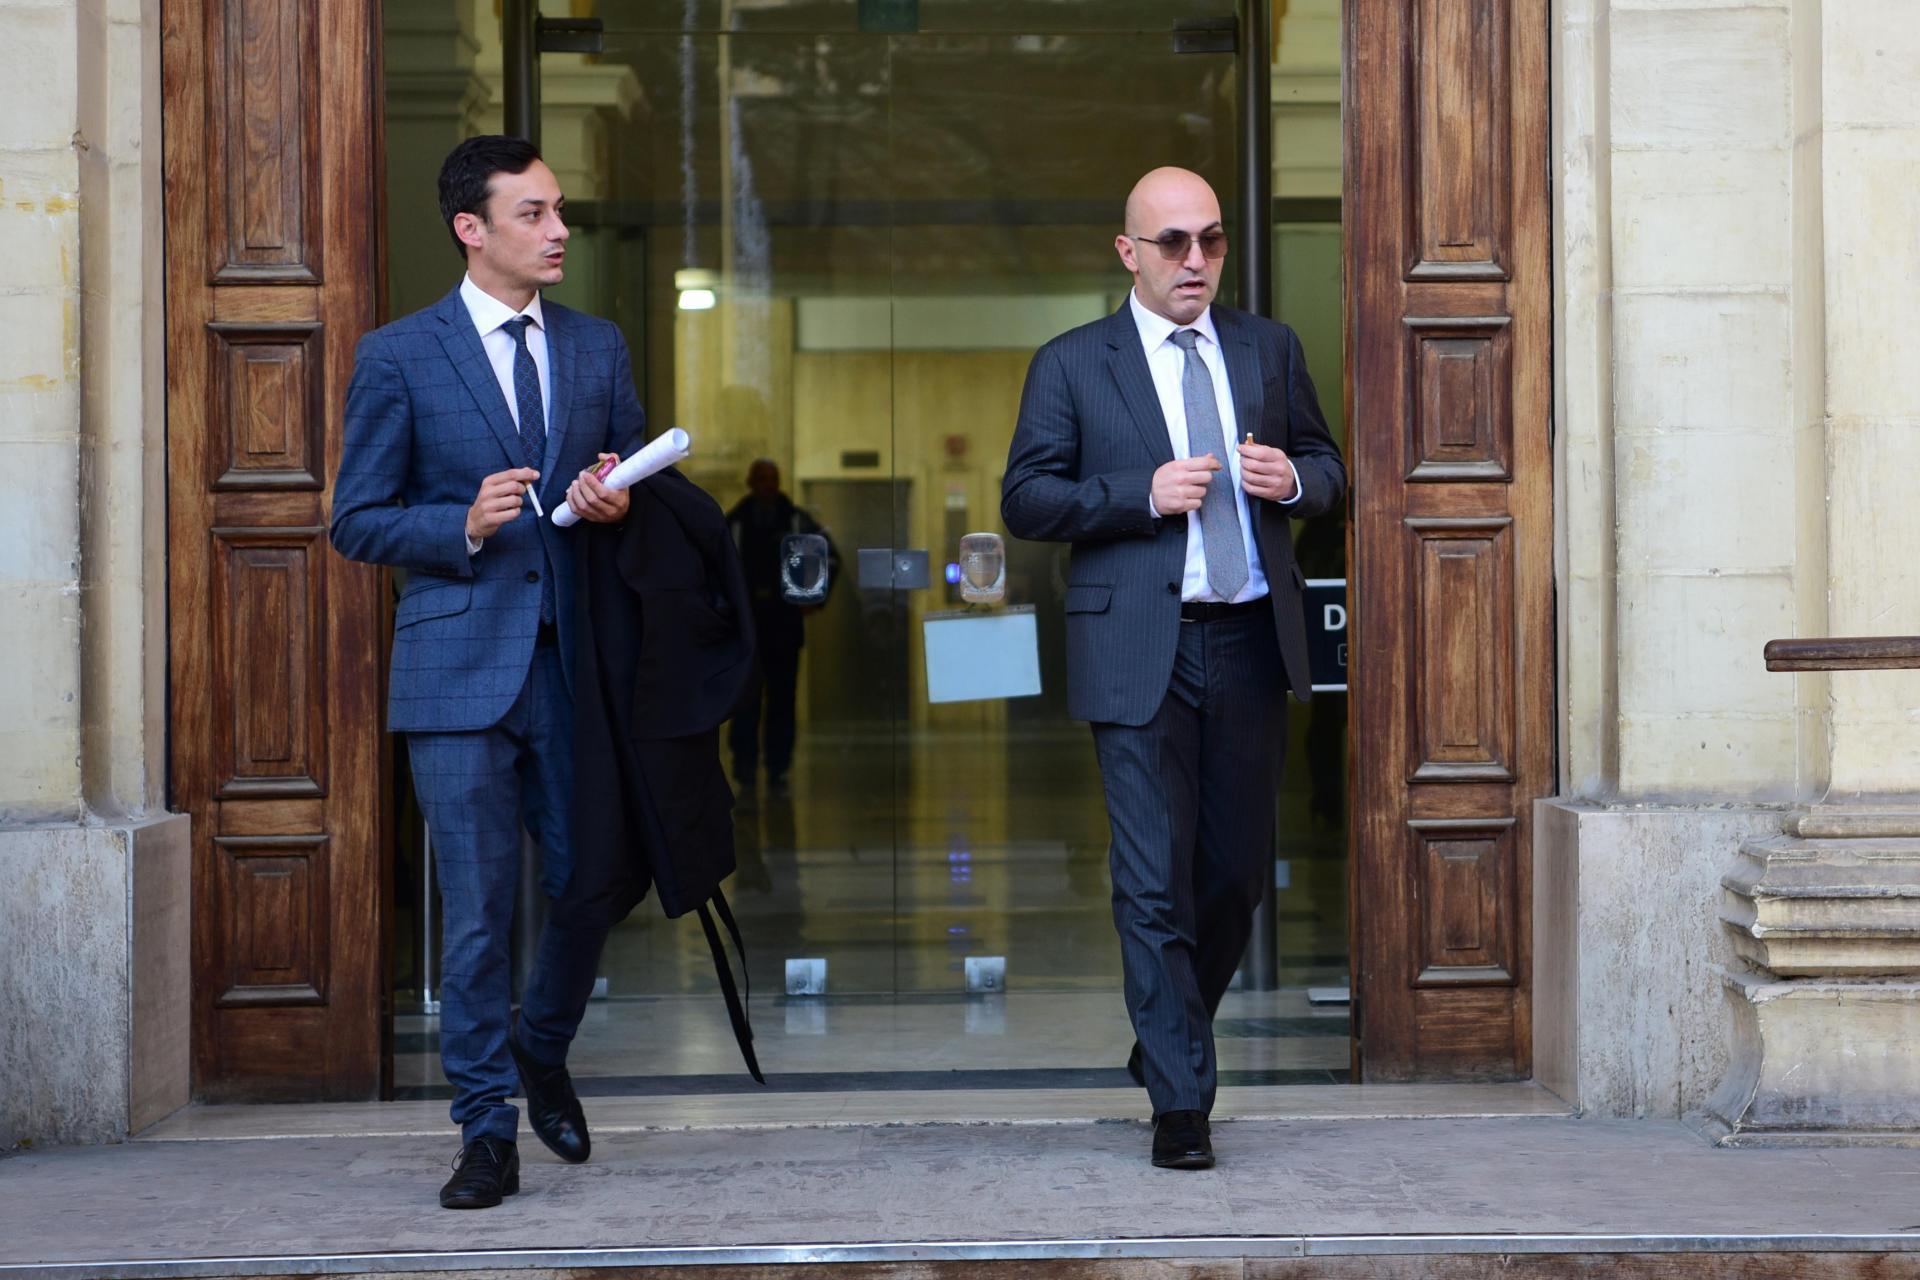 Yorgen Fenech (right) outside court with lawyer Gianluca Caruana Curran last November. Photo: Mark Zammit Cordina